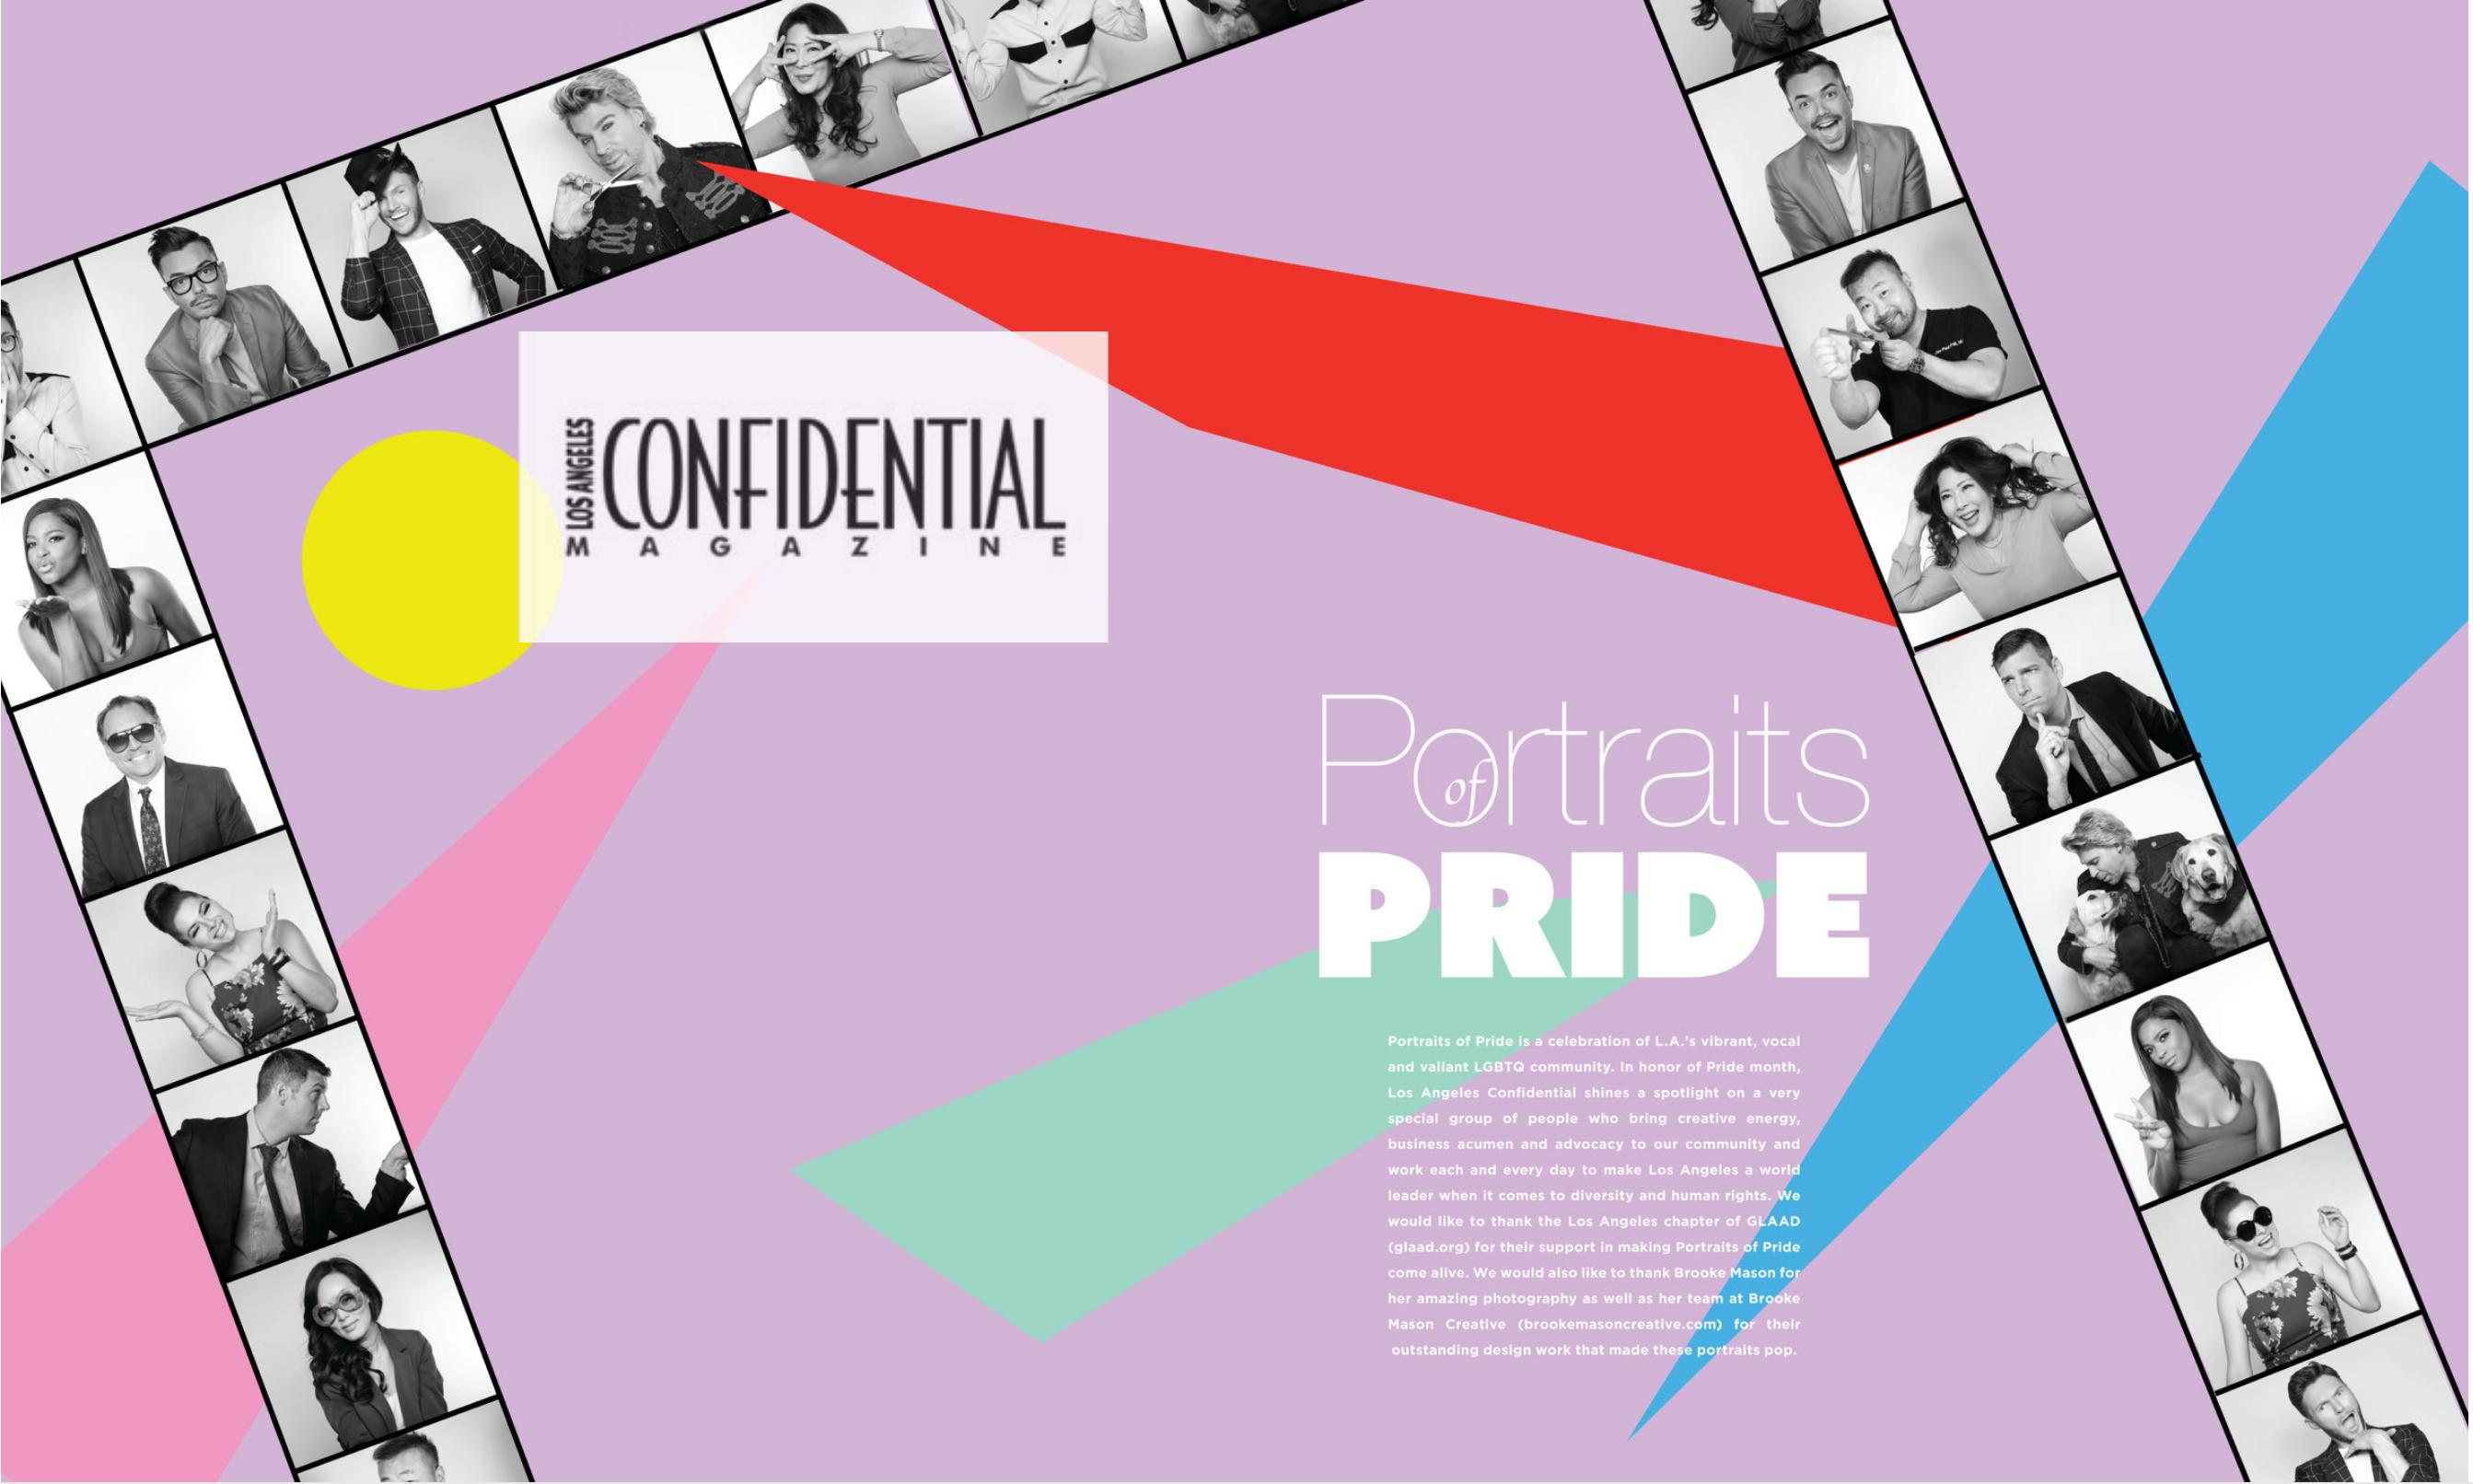 LAConfidentialMagazine